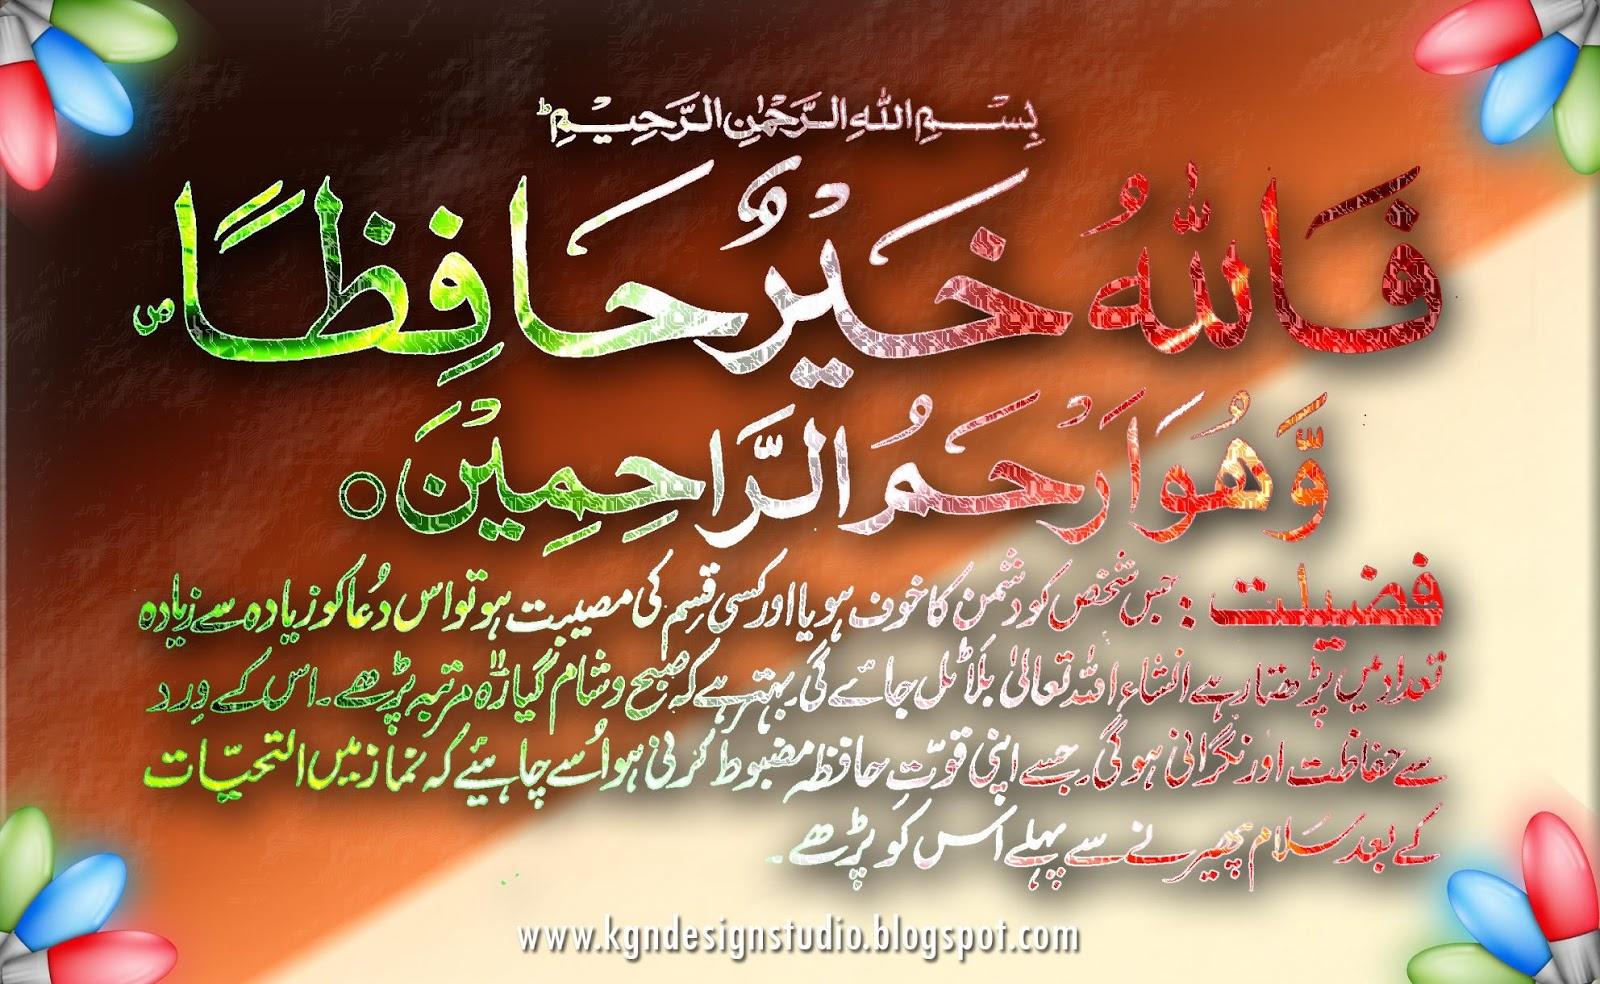 Kgn design studio urdu hadees wallpaper - Wallpaper urdu poetry islamic ...